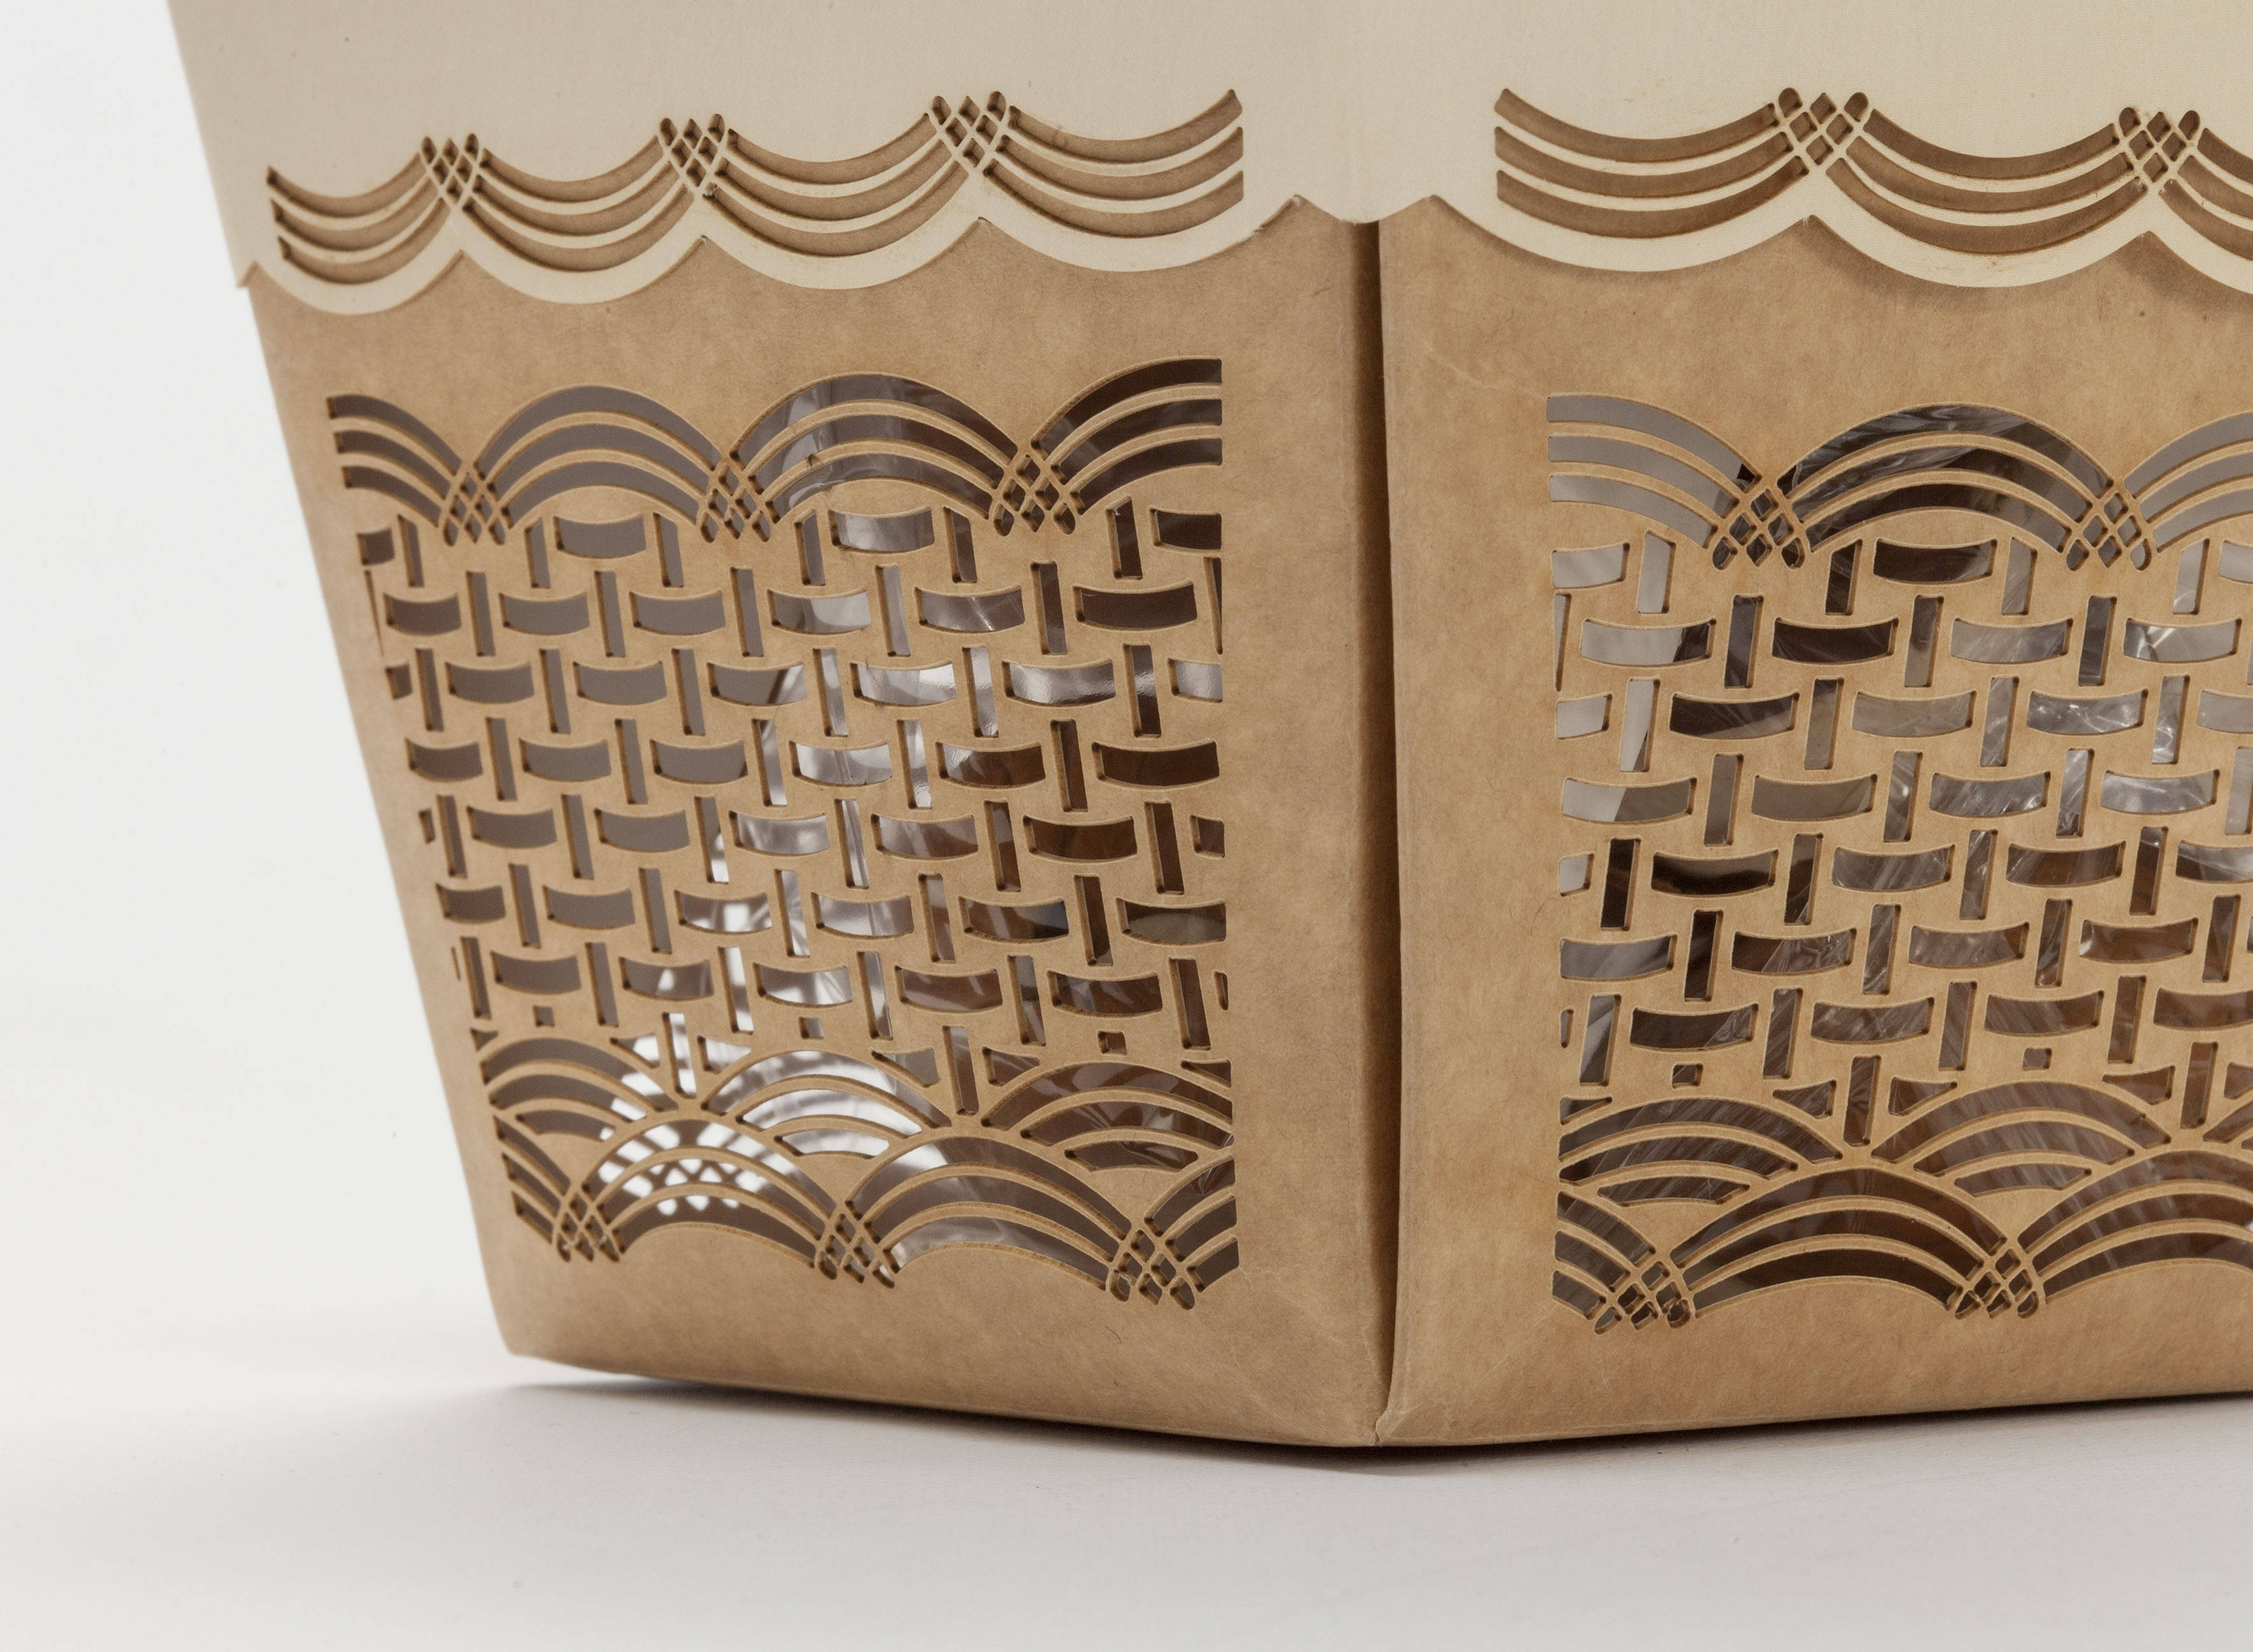 carton-award-image 25290